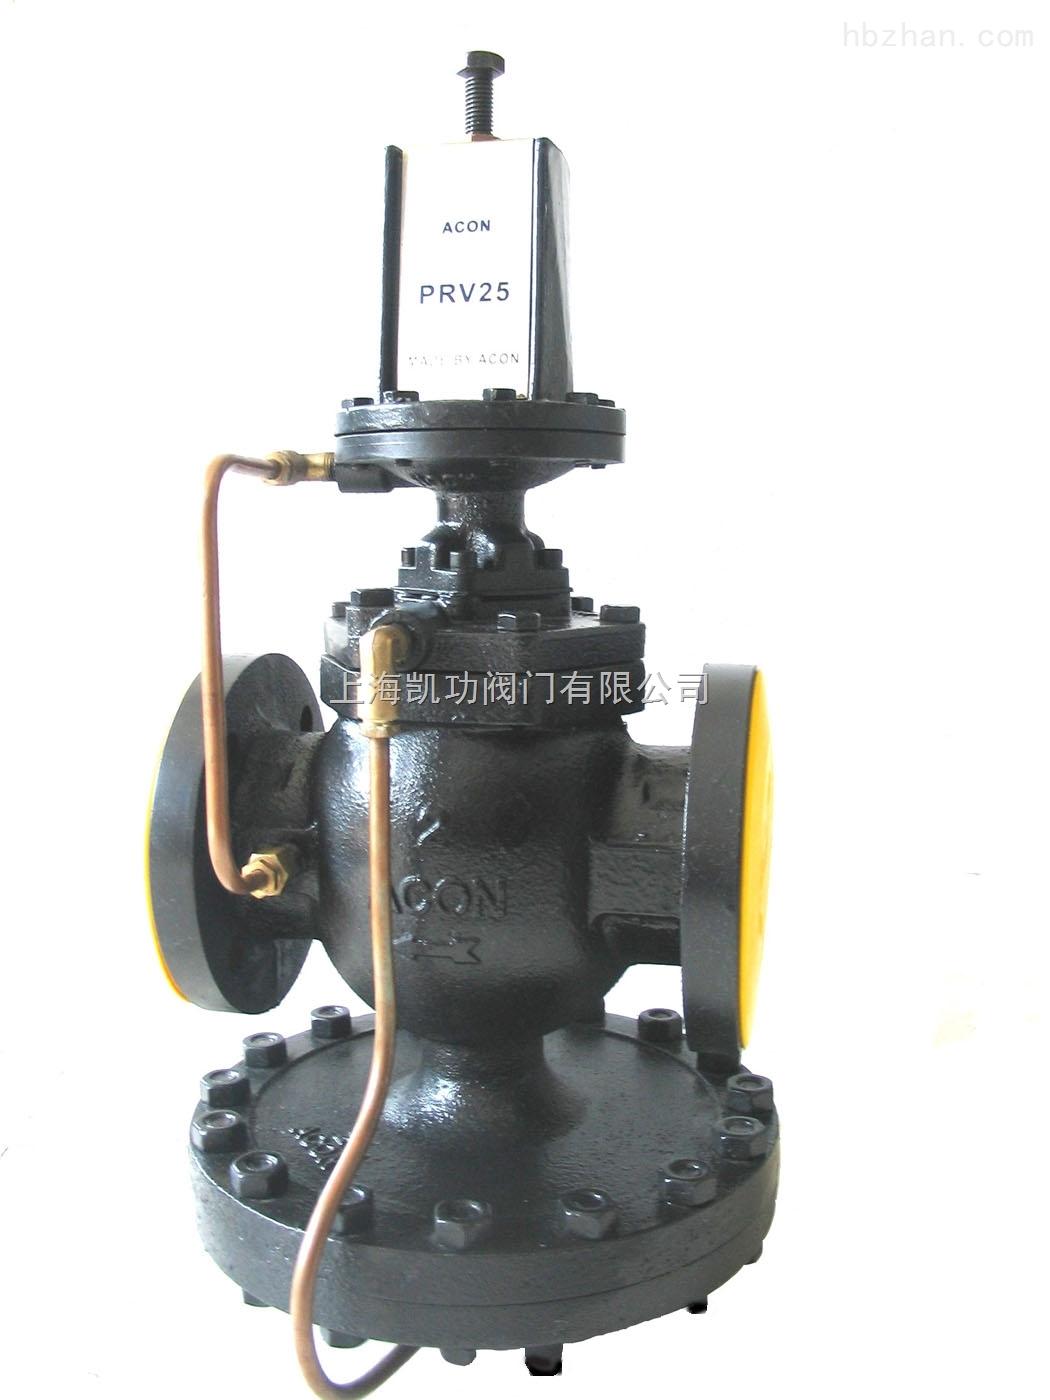 25p斯派莎克蒸汽减压阀,先导薄膜式蒸汽减压阀图片